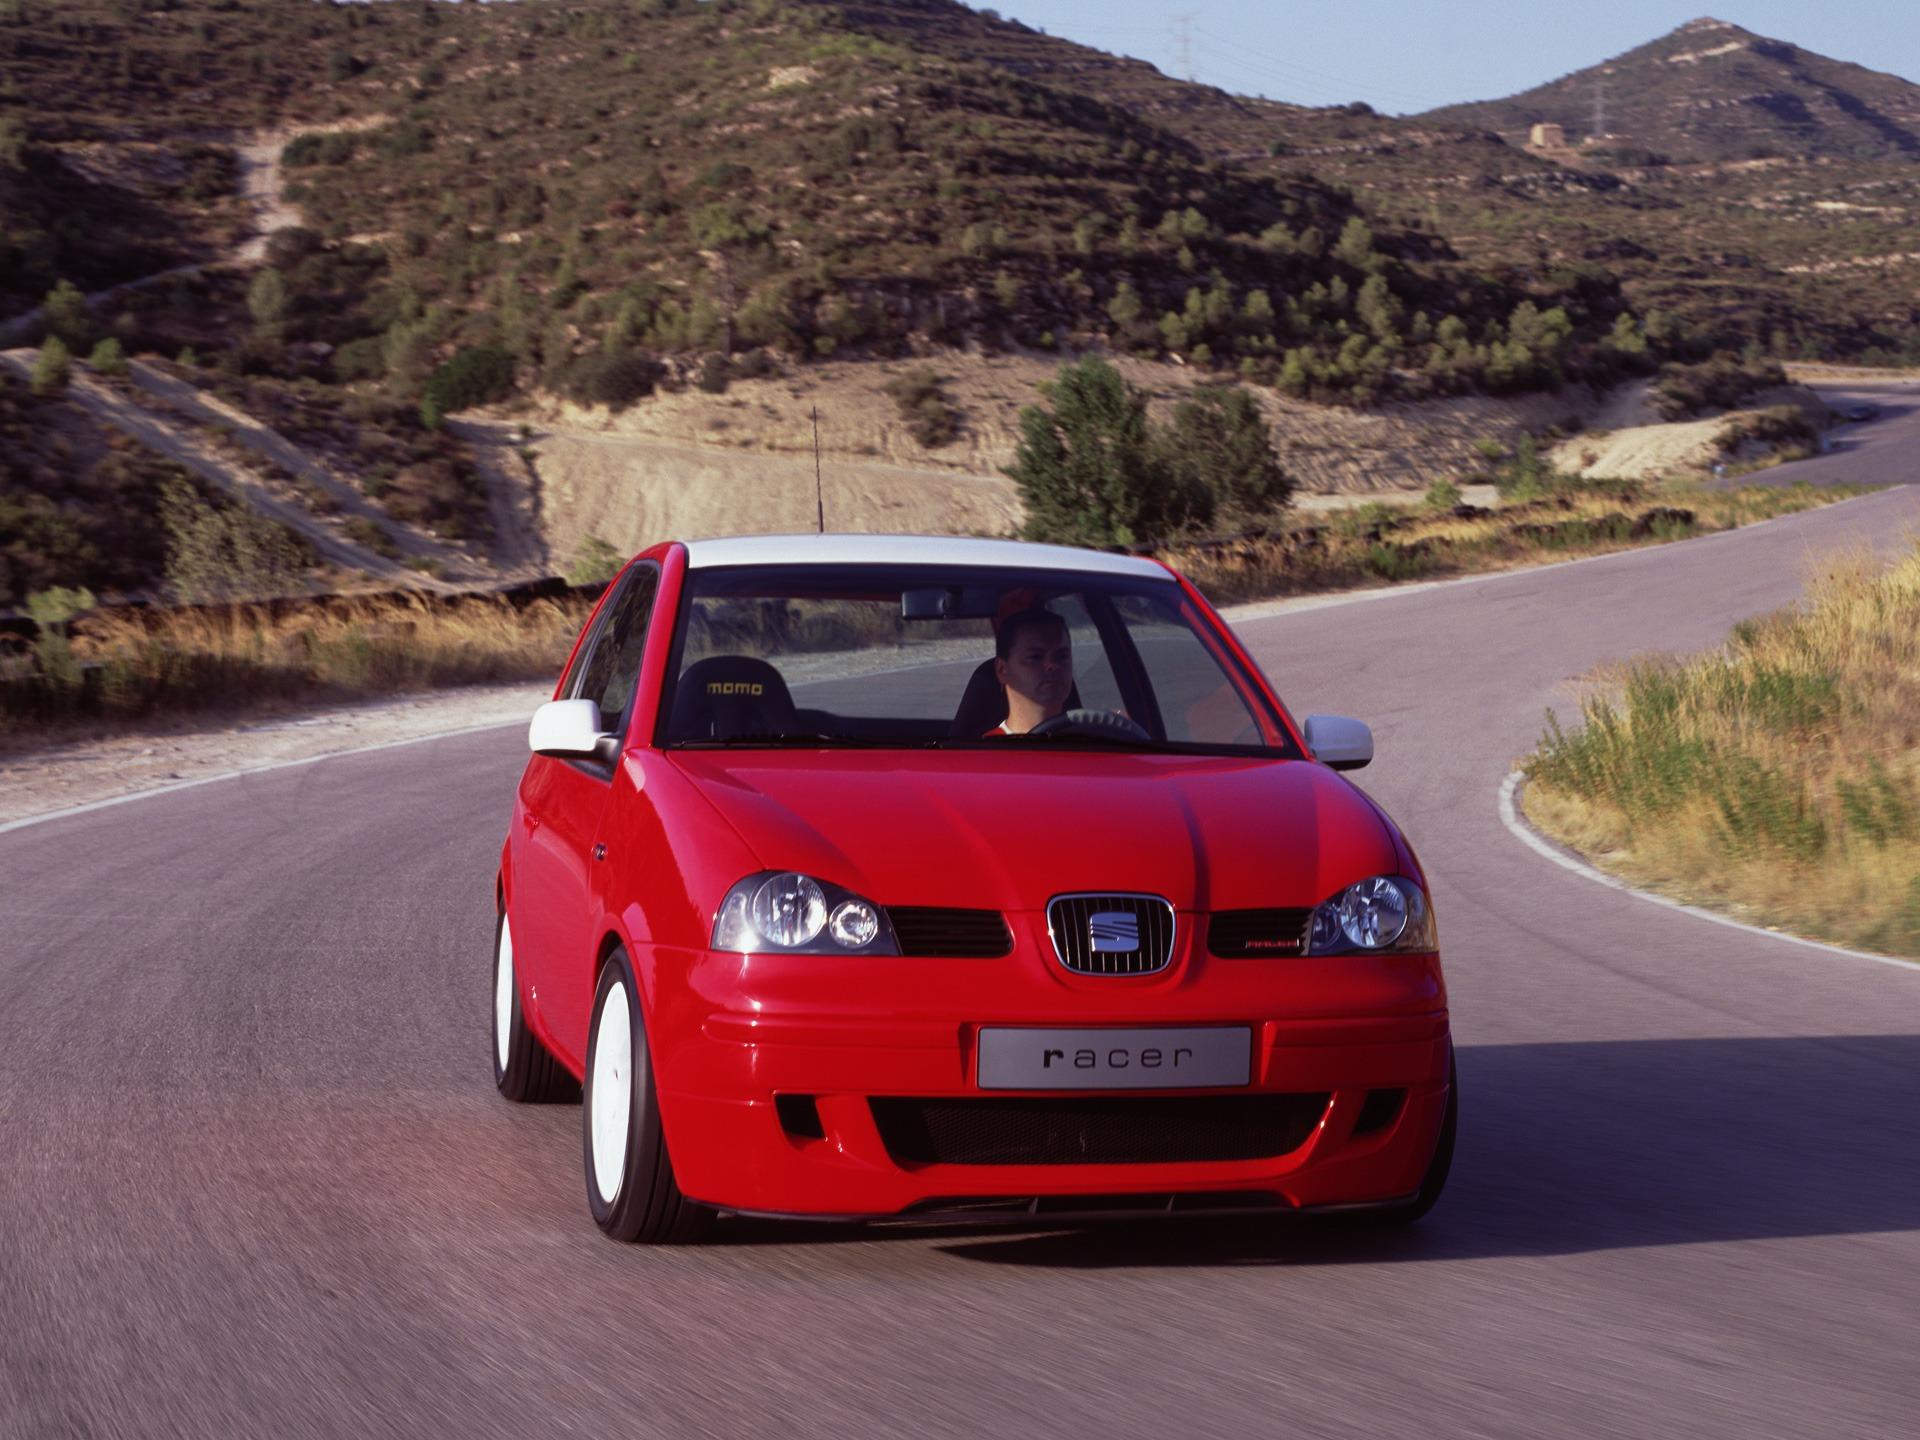 seat arosa racer concept 2001 old concept cars. Black Bedroom Furniture Sets. Home Design Ideas